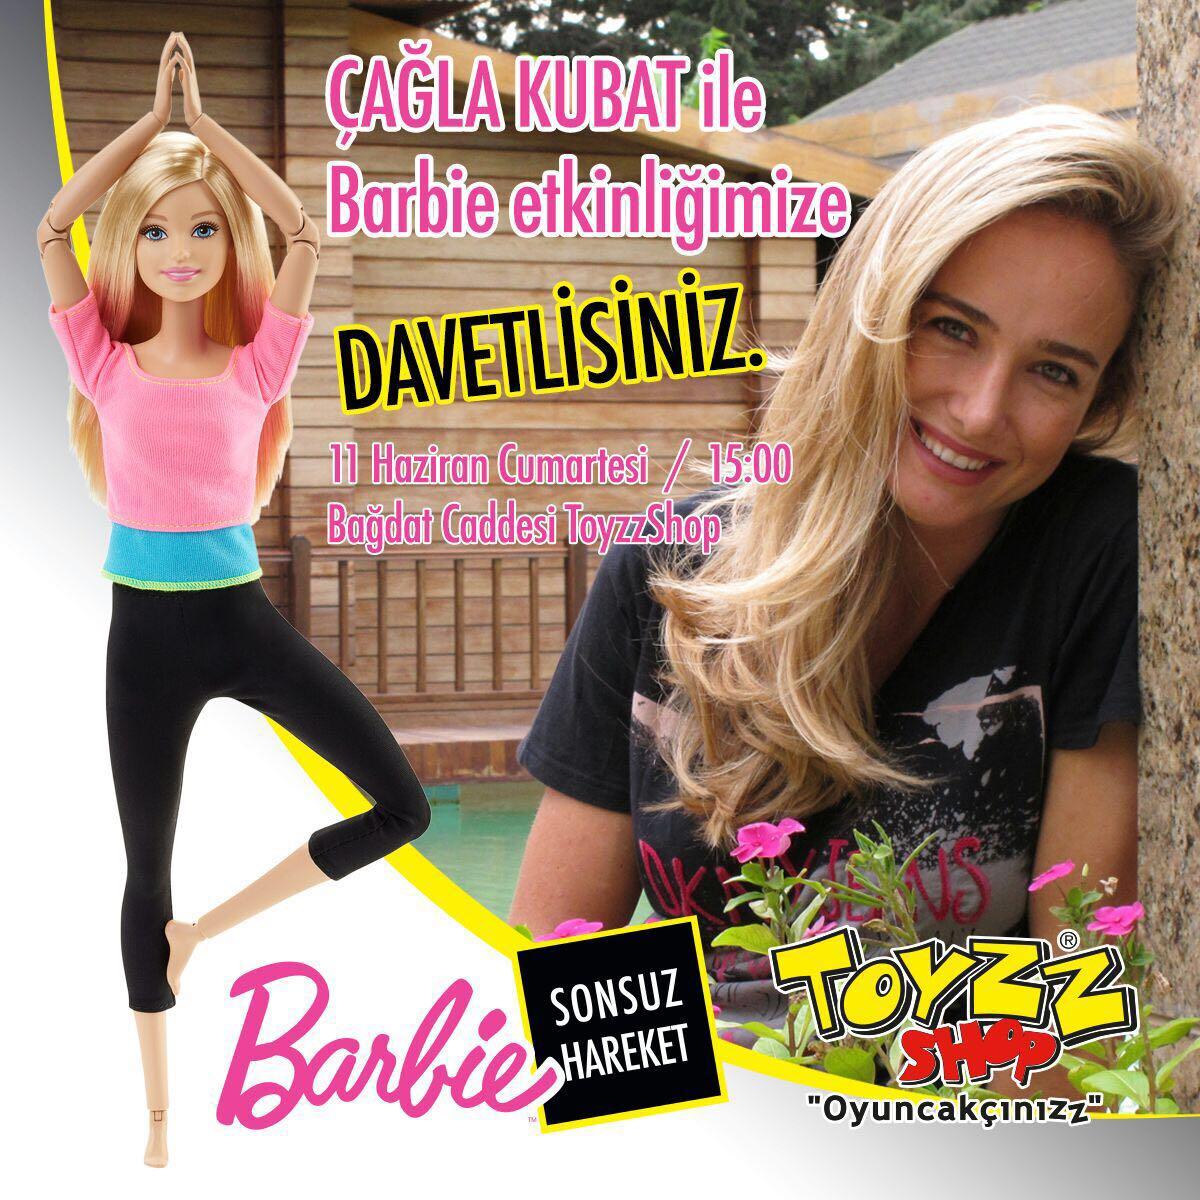 barbie_cagla_kubat_1